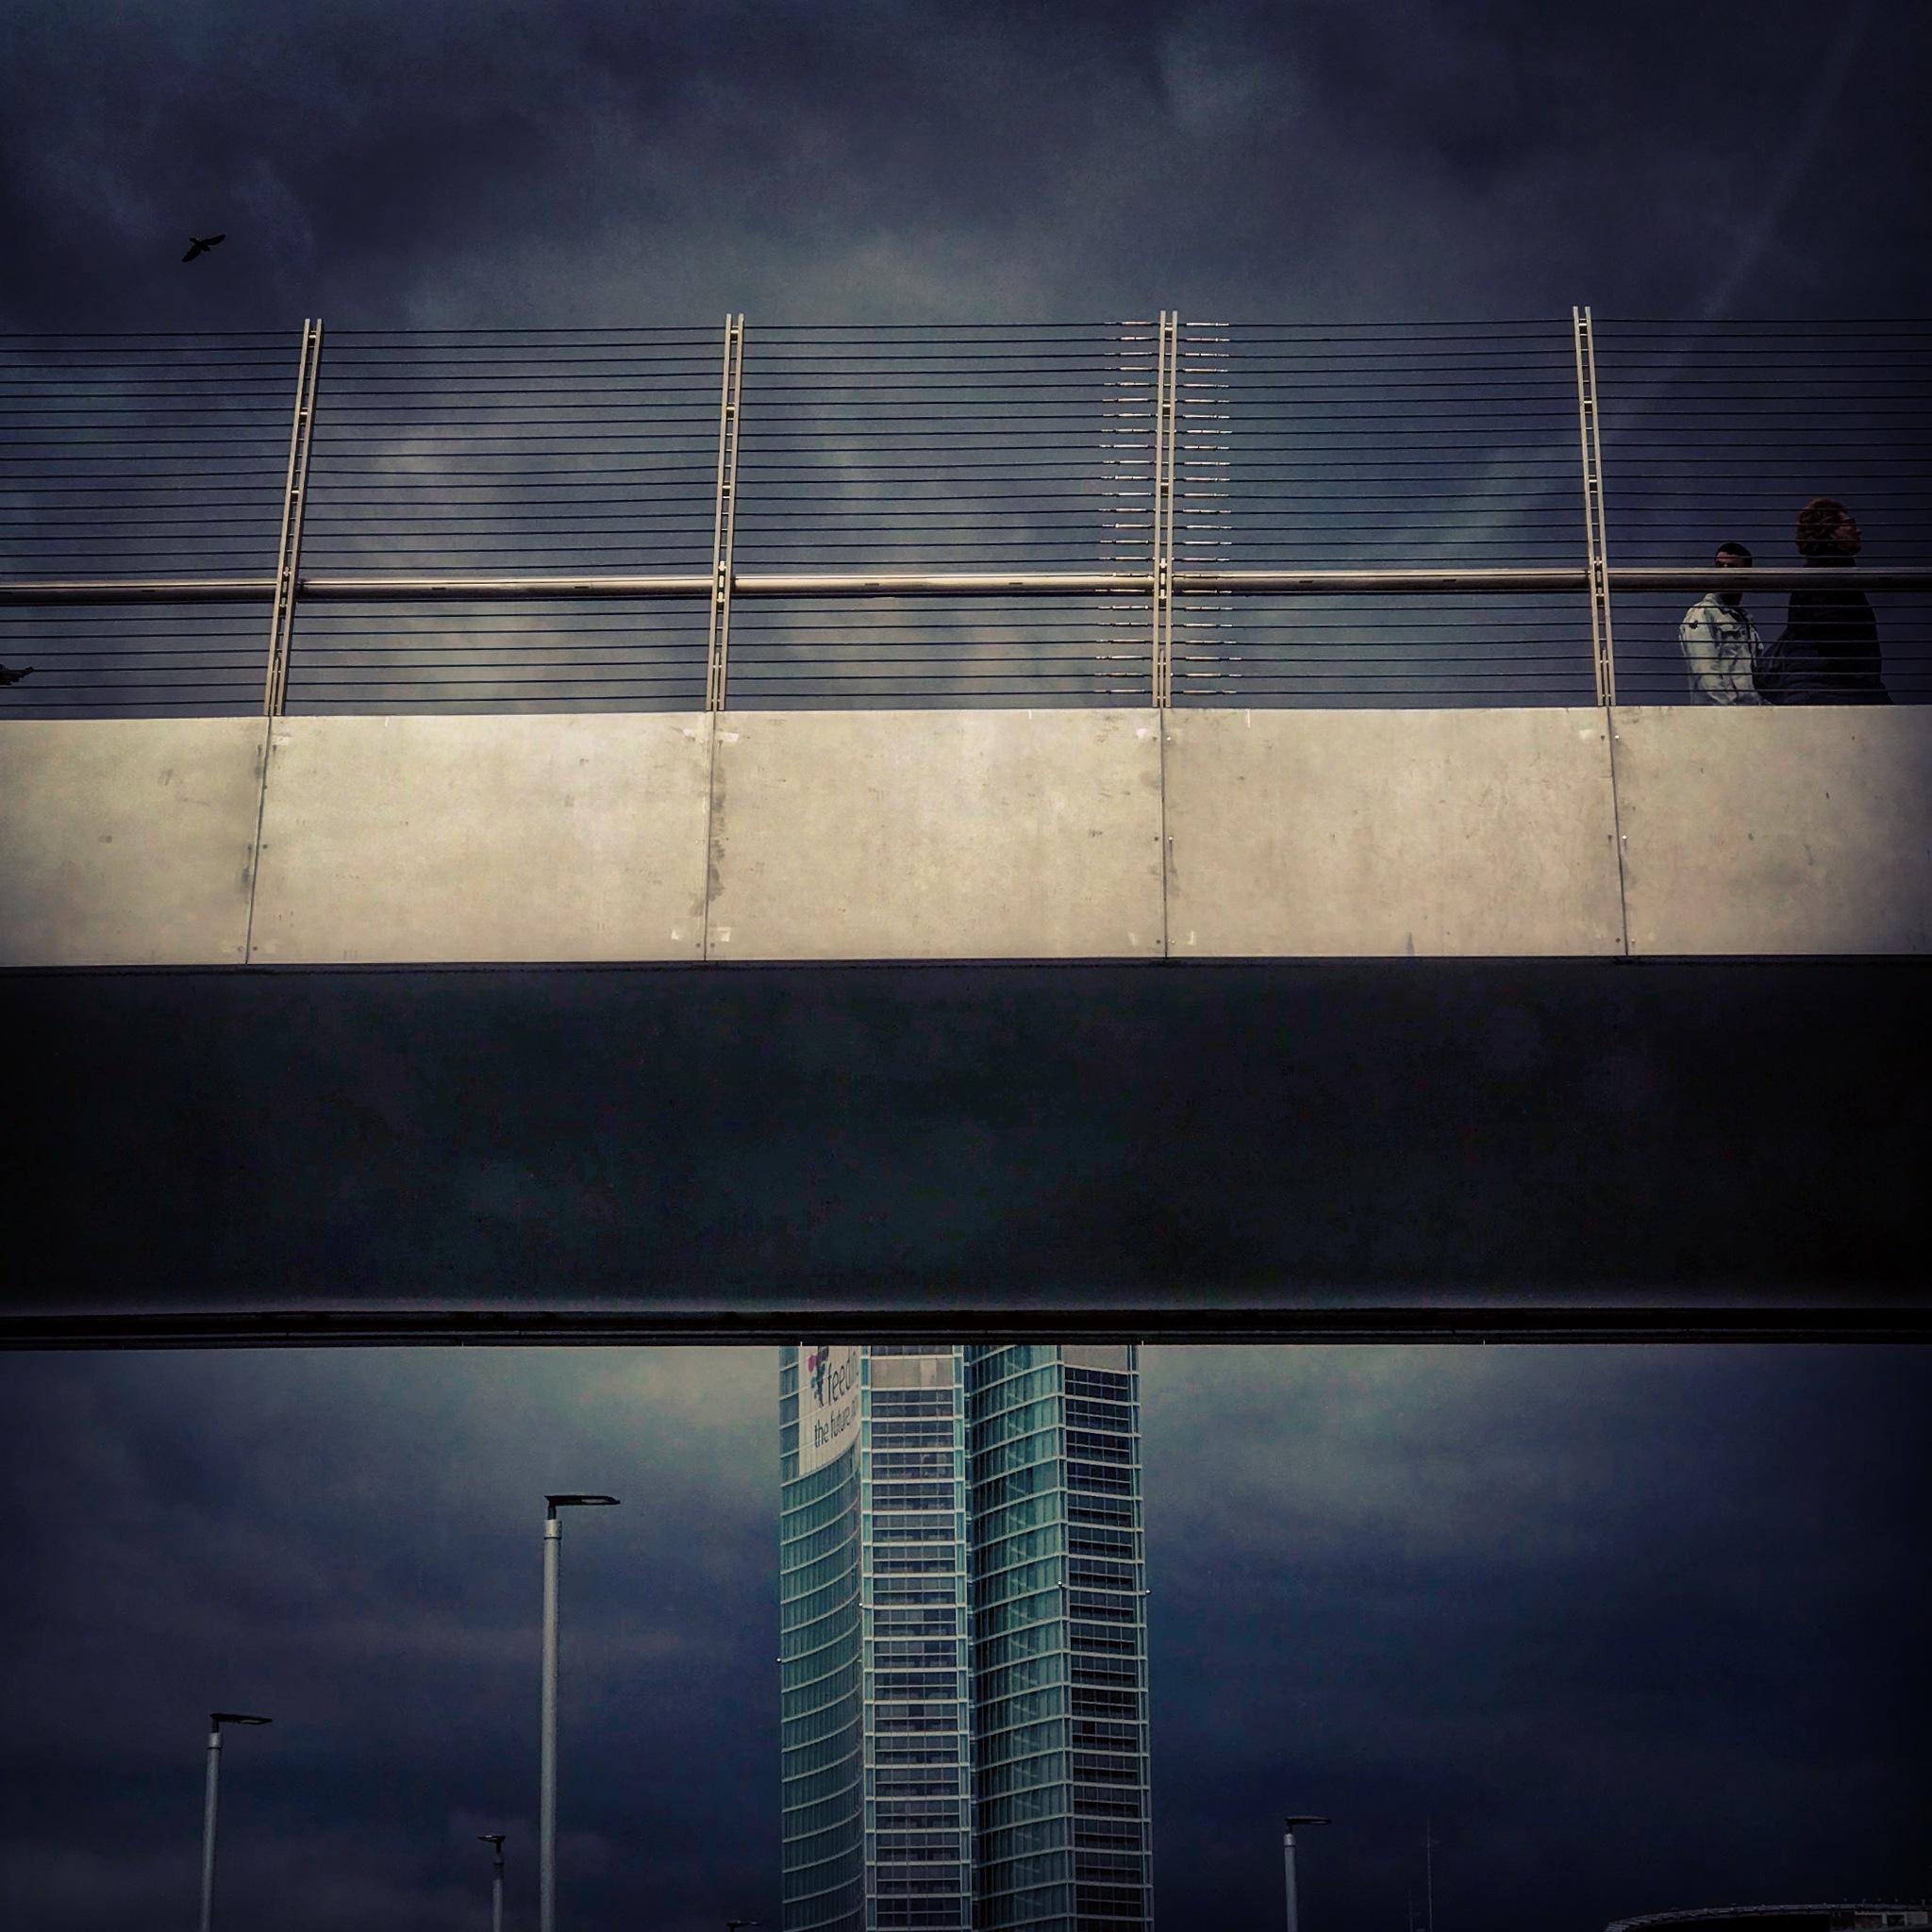 Untitled by Alberto Badocchi